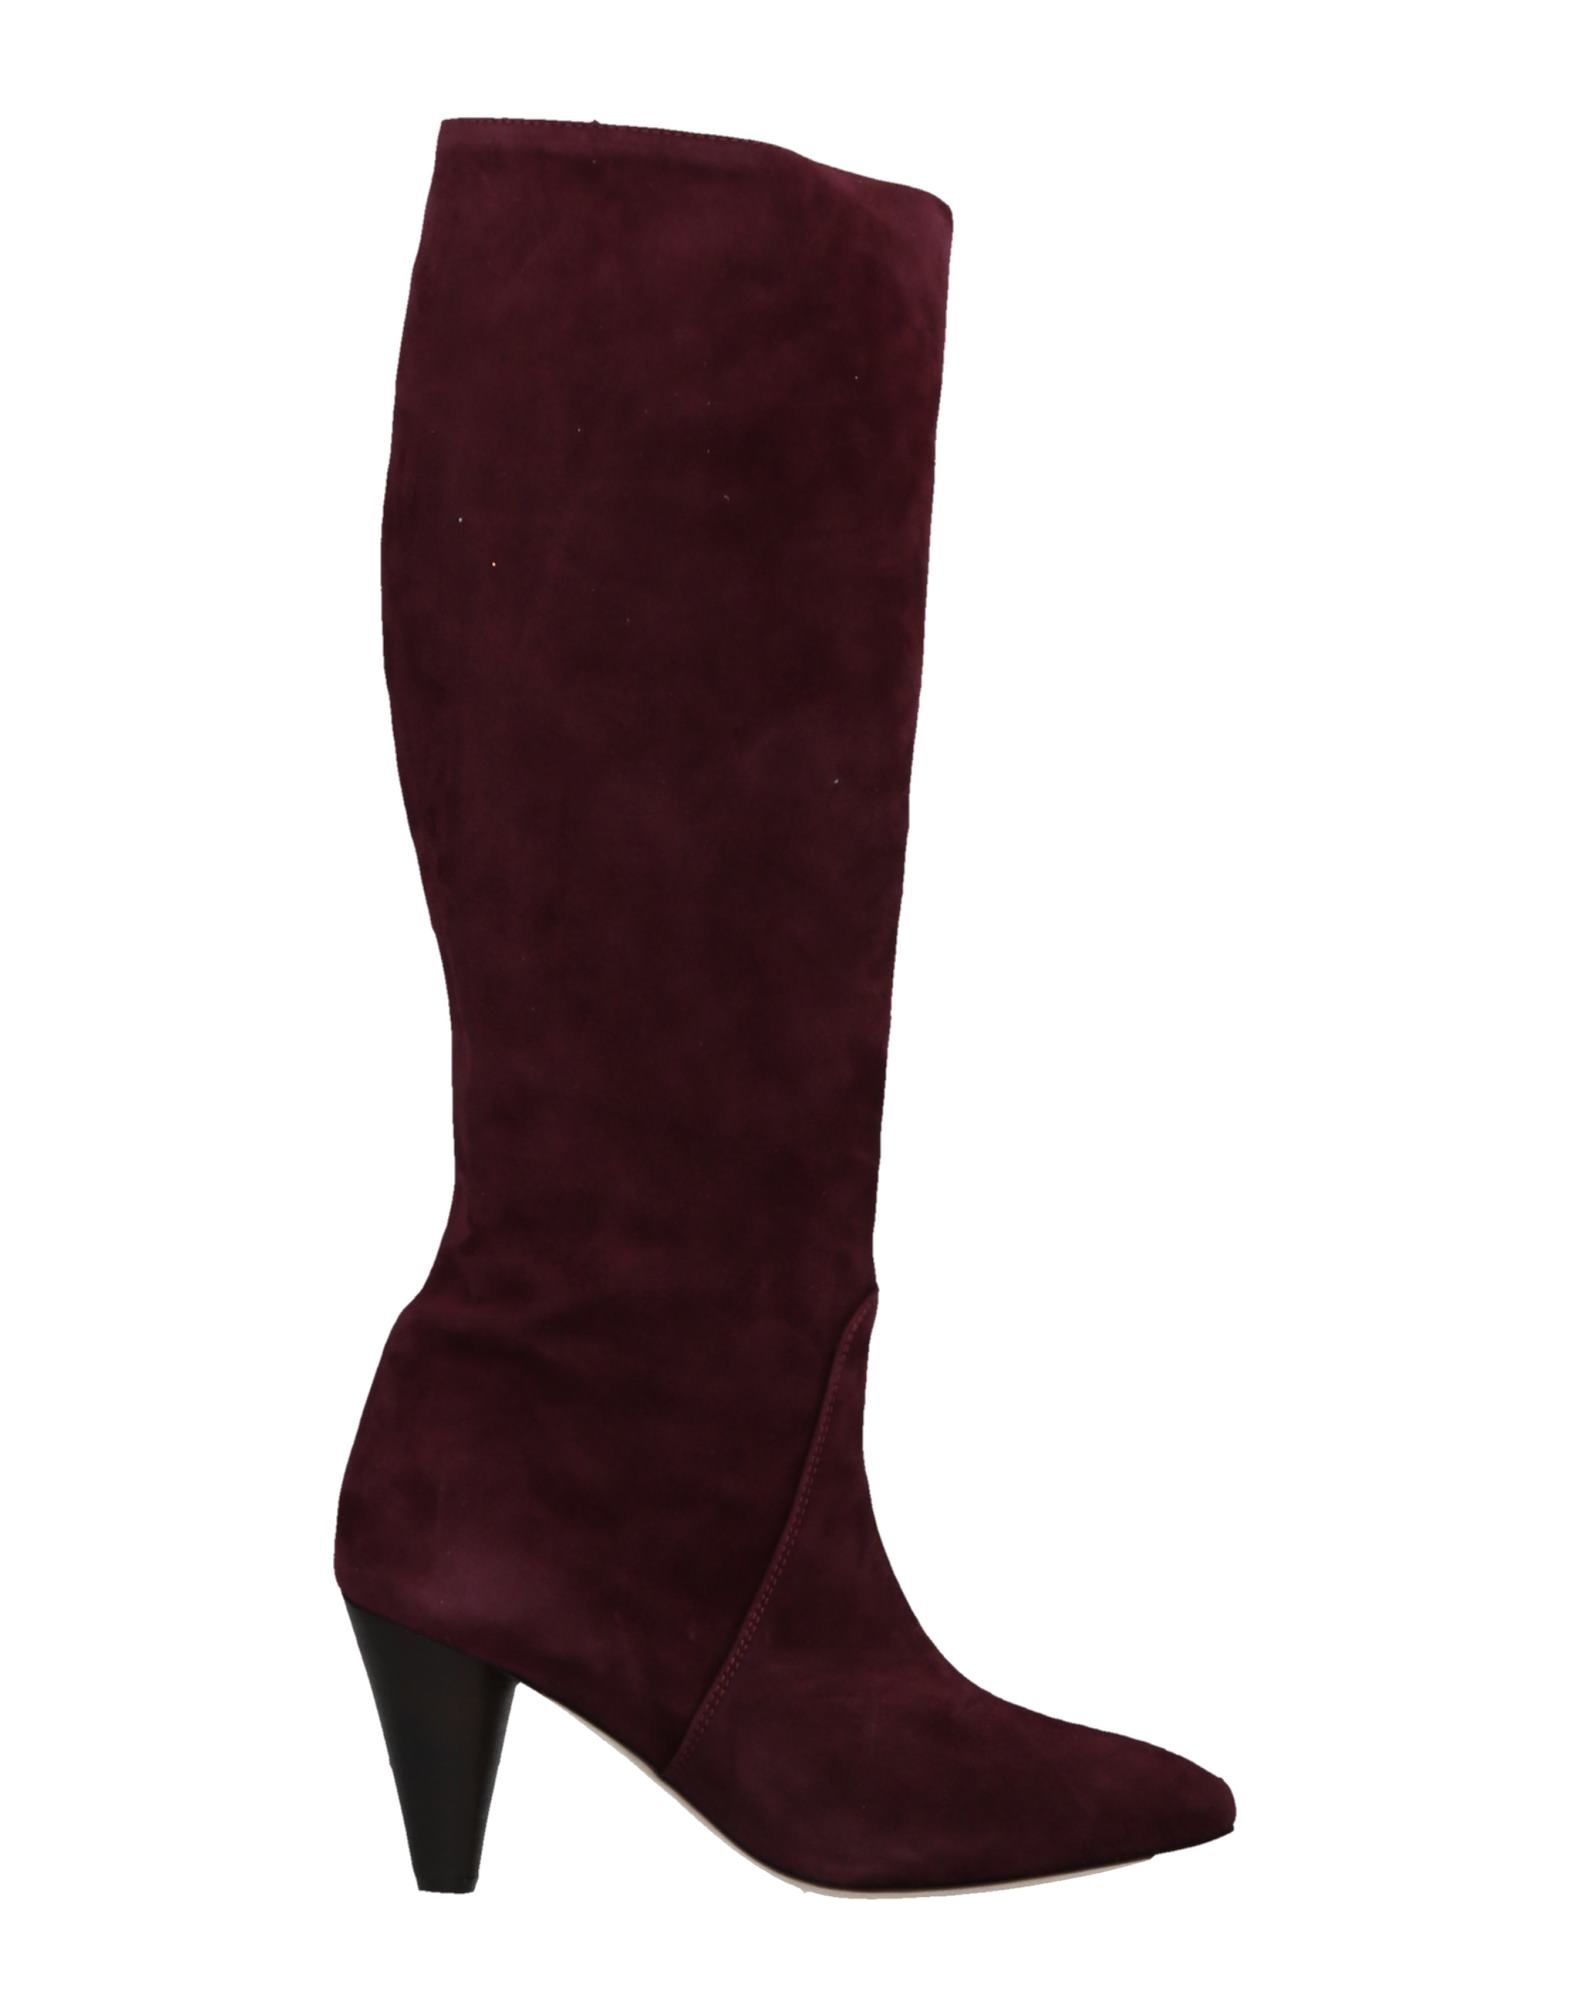 Moda Stivali Stivali Moda L'arianna Donna - 11521182XM 84fb63